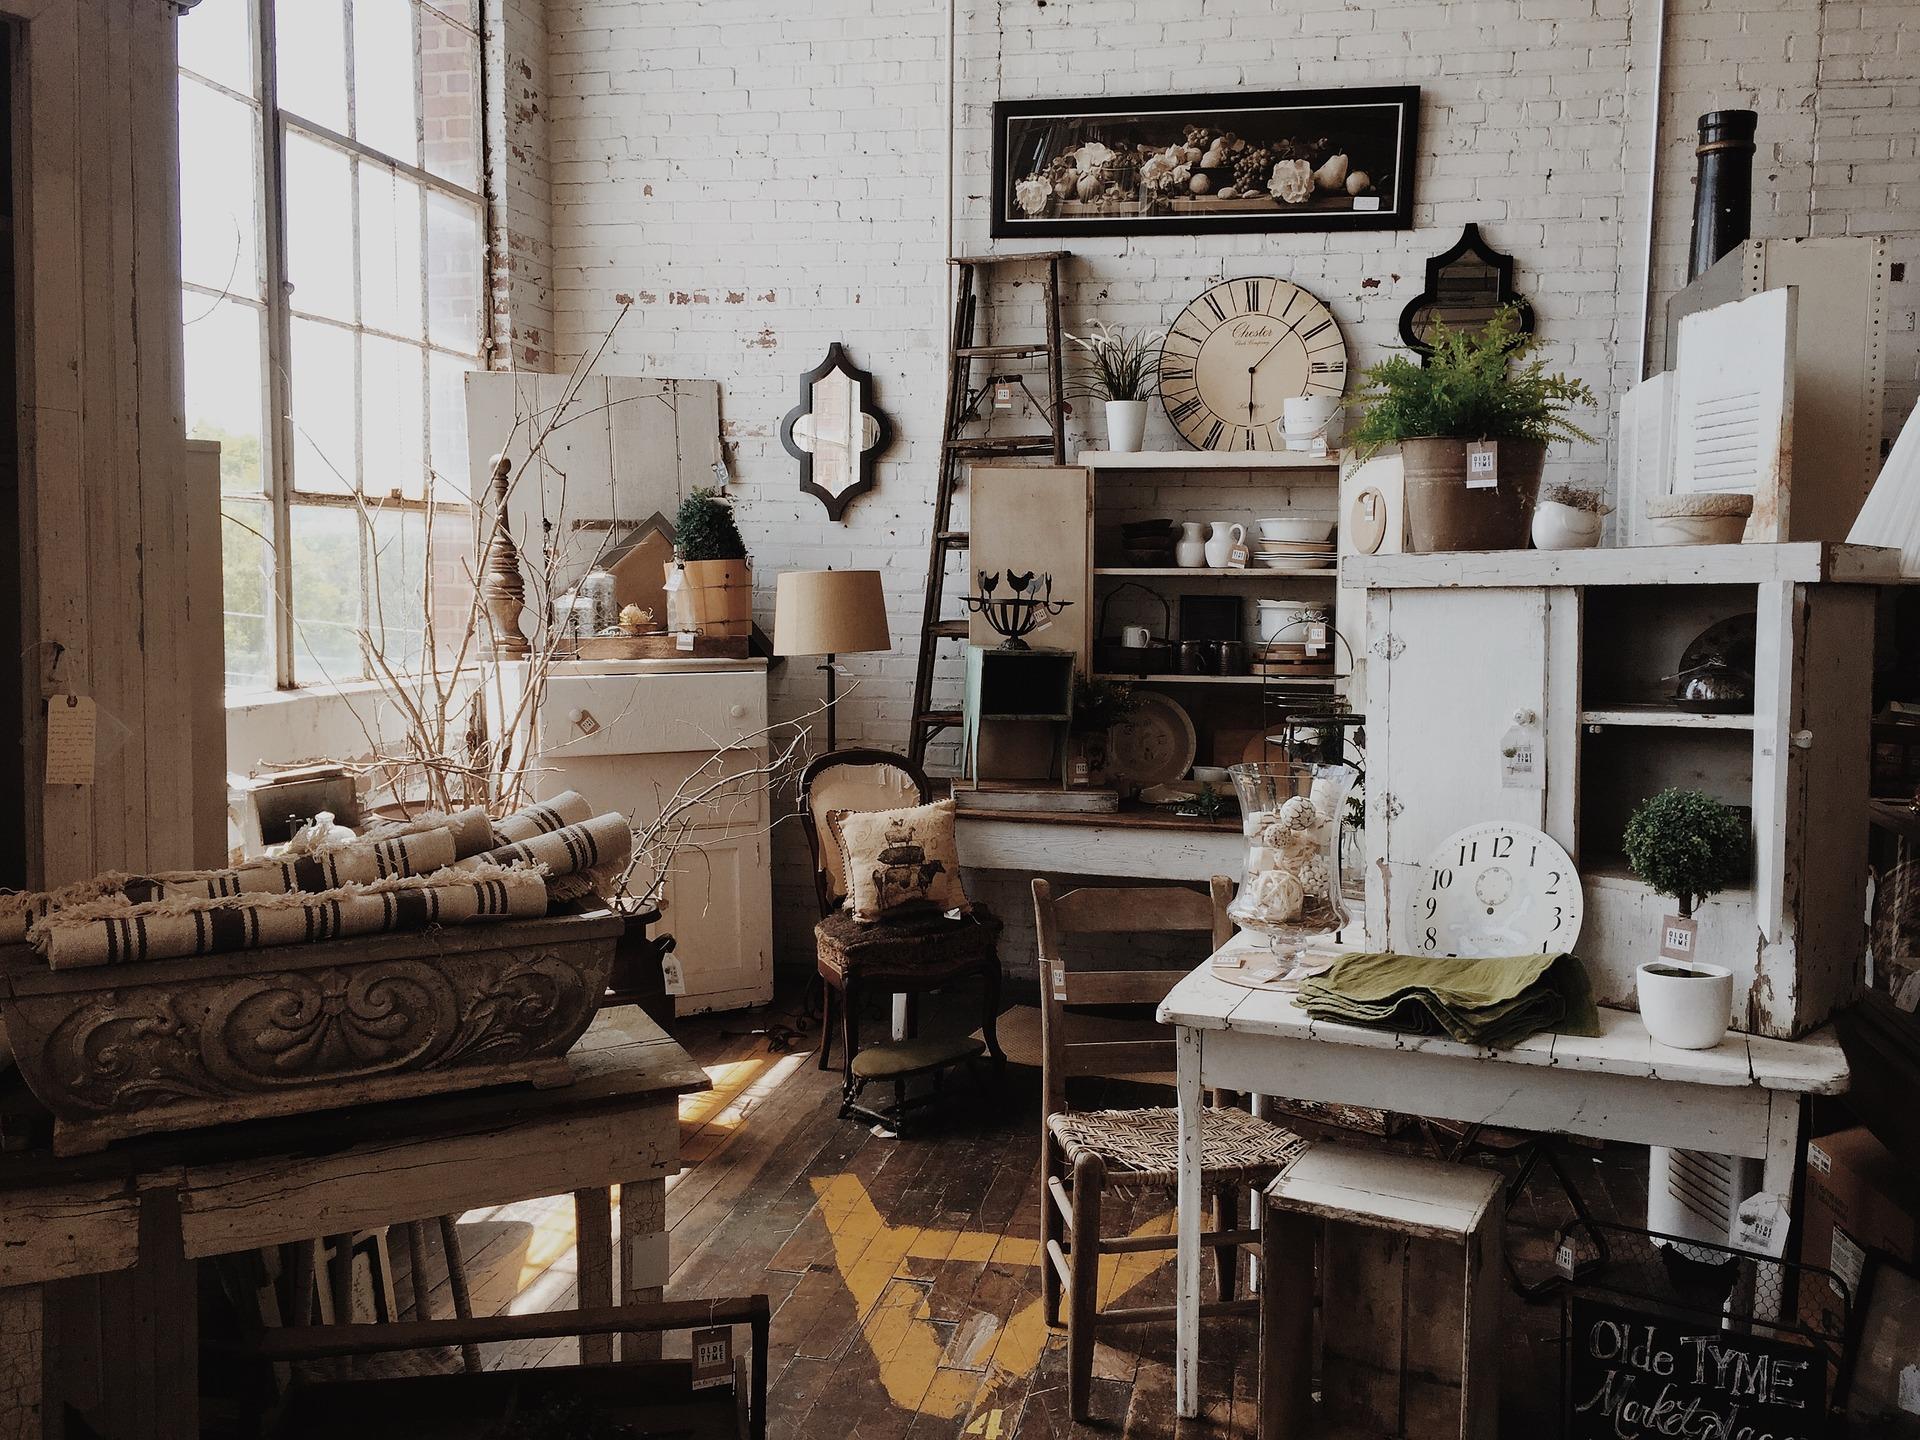 Arredamento Svedese Vintage : Arredamento vintage l equilibrio perfetto in un mix tra moderno